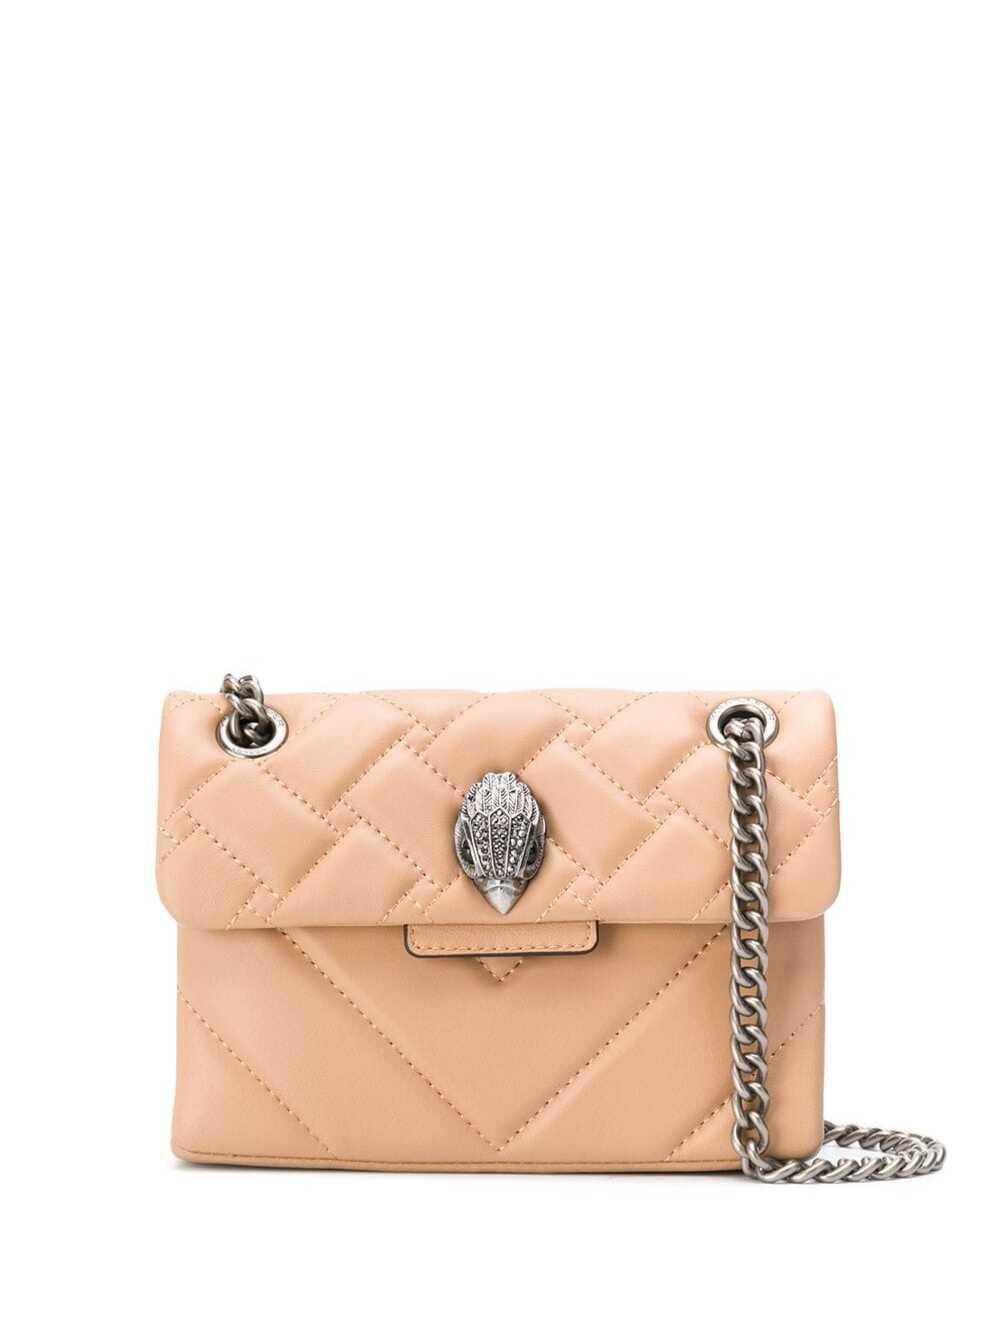 Kensington Beige Quilted Leather Crossbody Bag